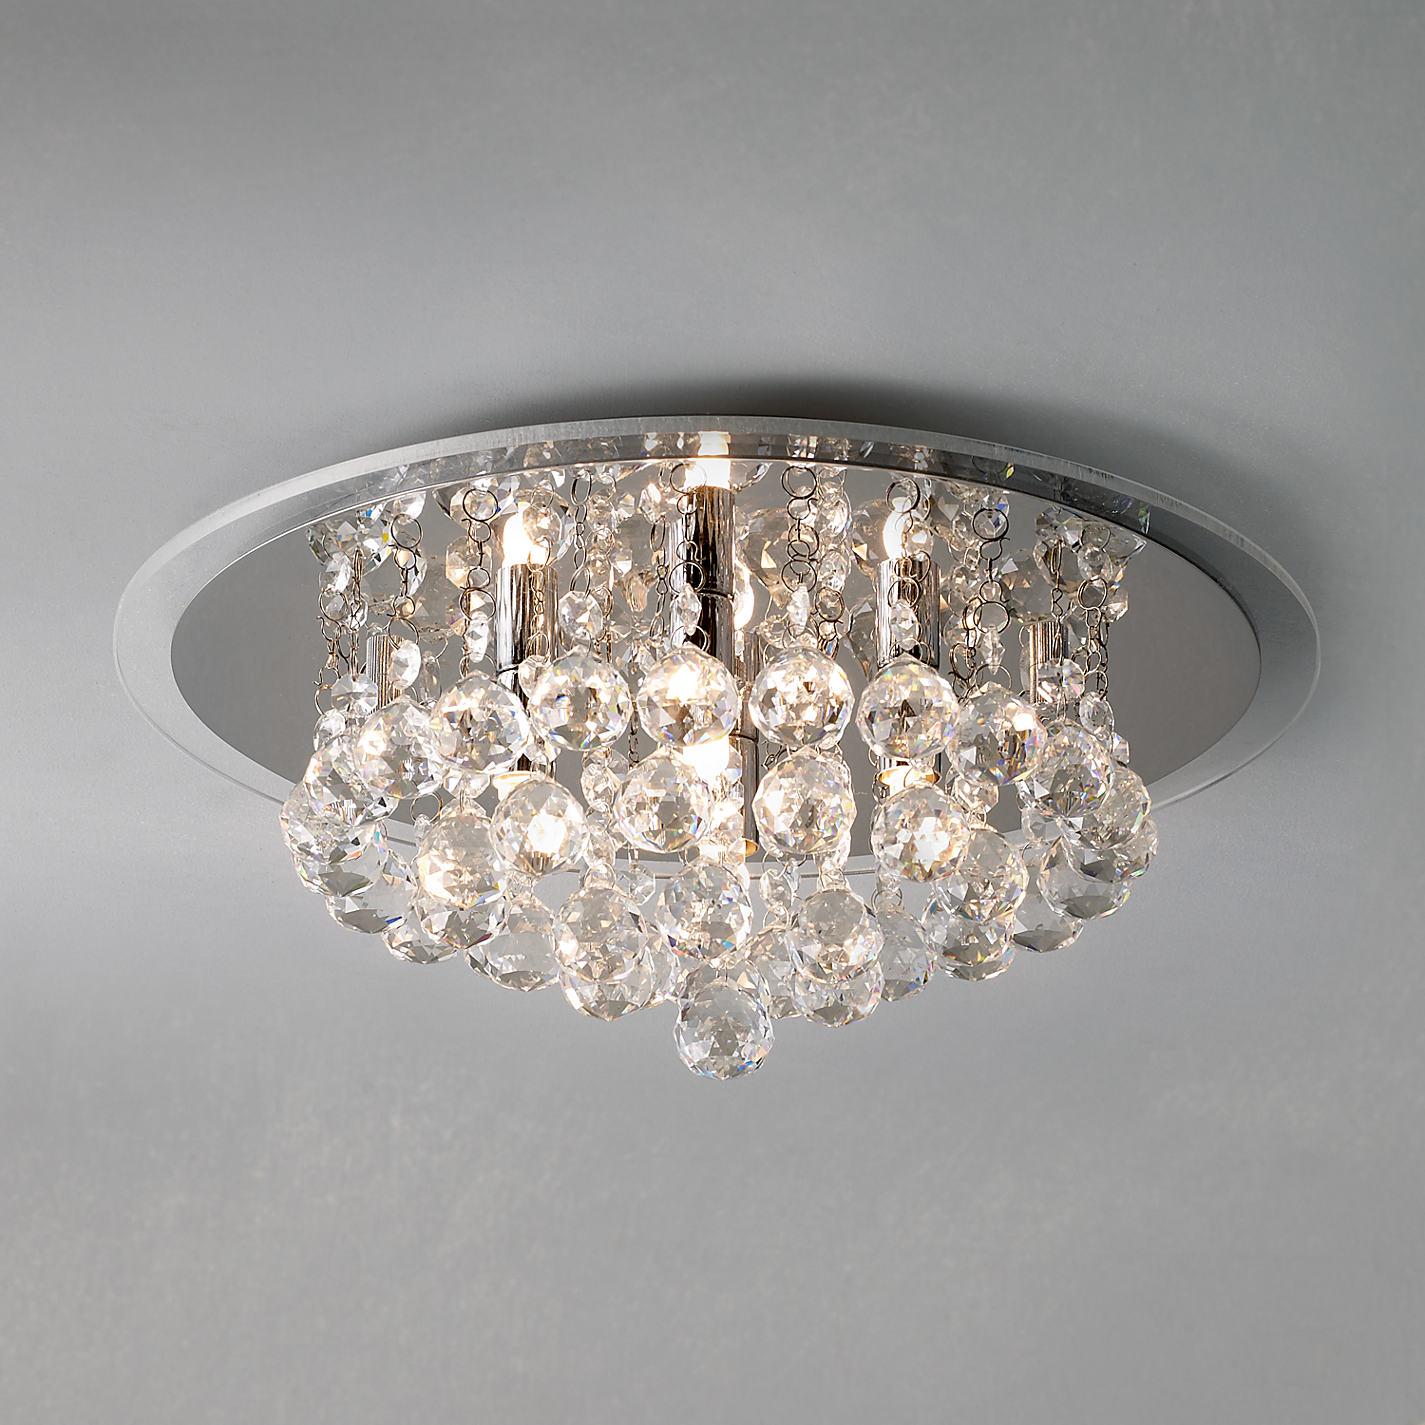 crystal ceiling lighting john lewis astro lighting evros light crystal bathroom